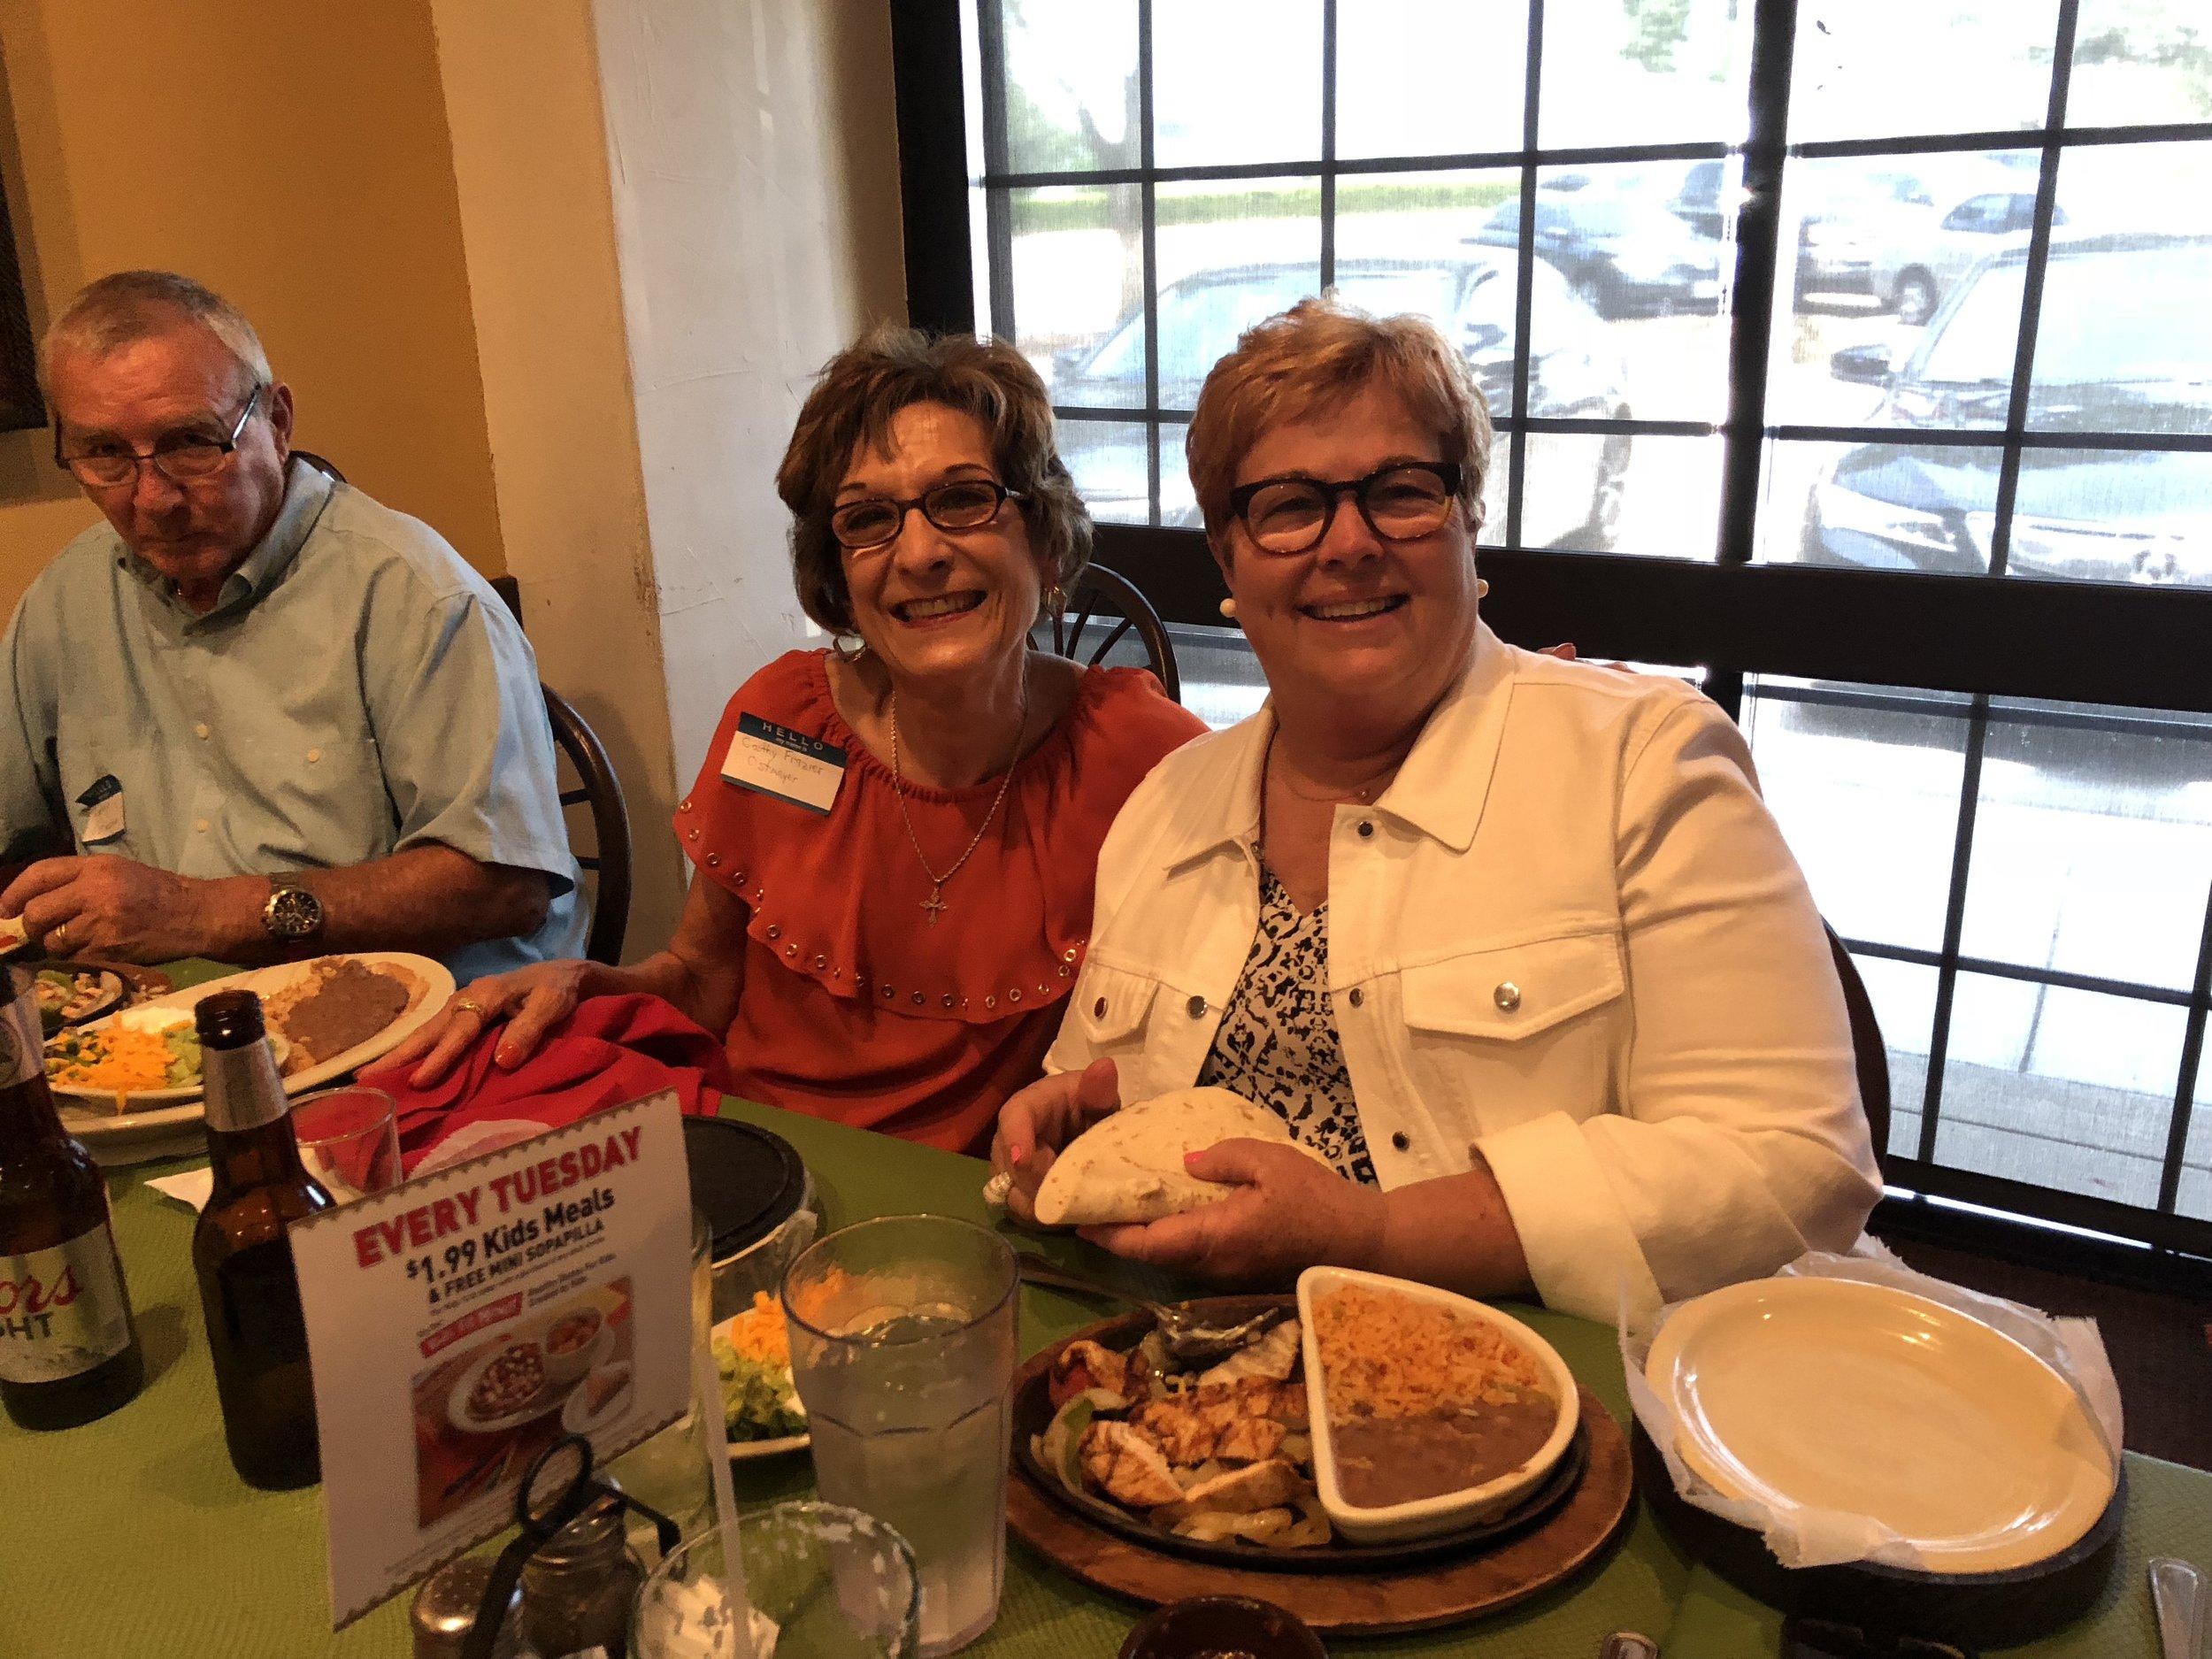 Cathy Frazier Ostmeyer and Sally Russell Grinsfelder